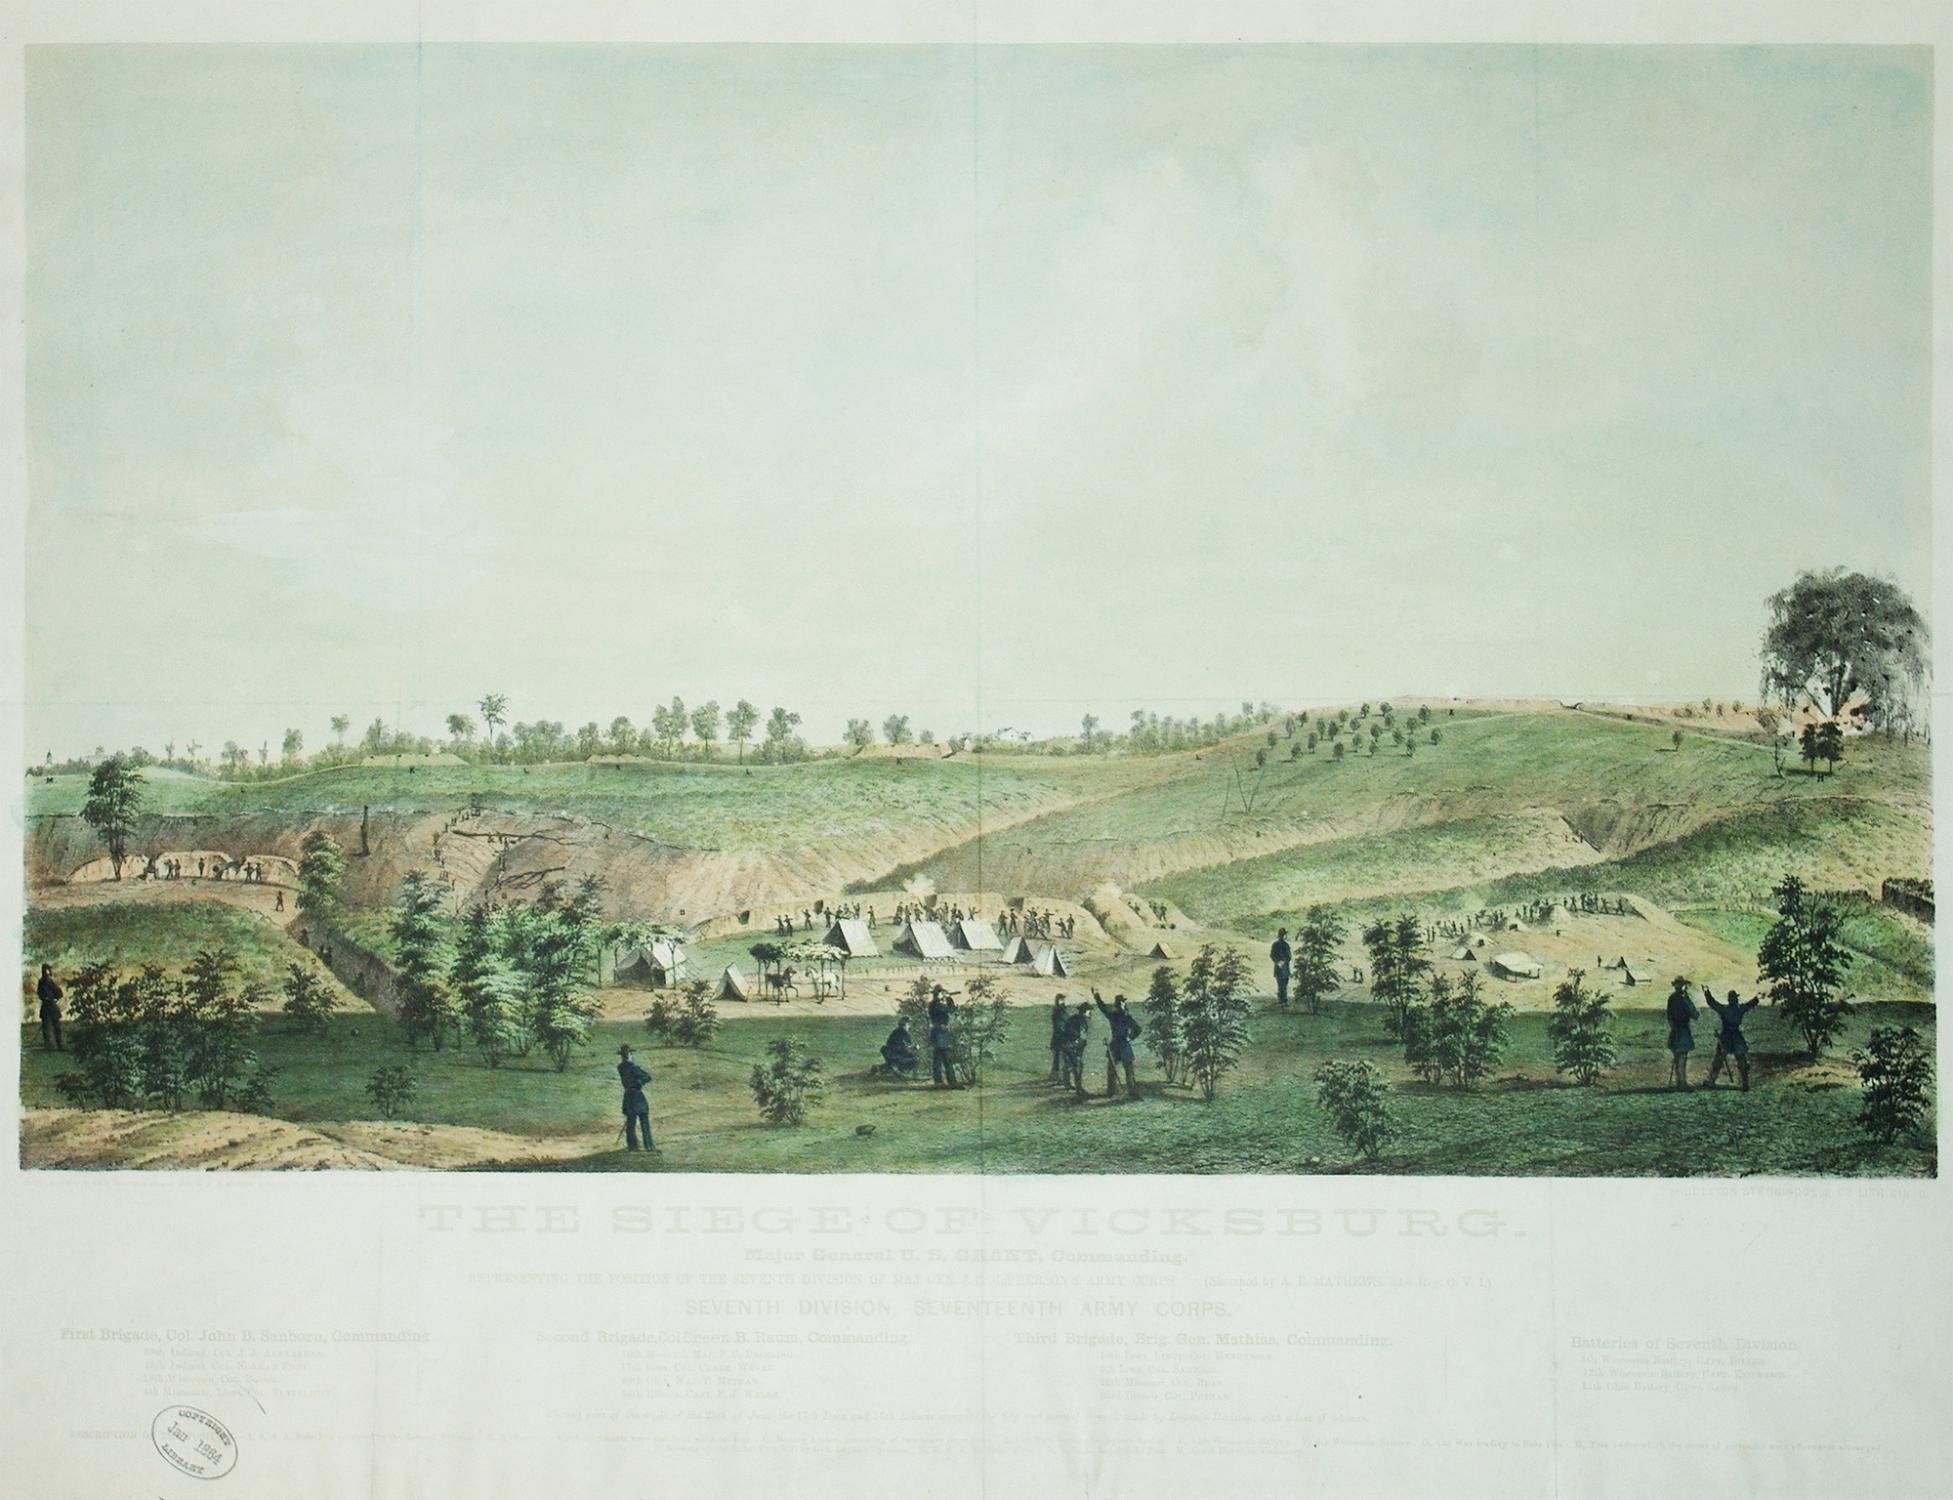 The Siege on Vicksburg.: Middleton Strobridge & Co